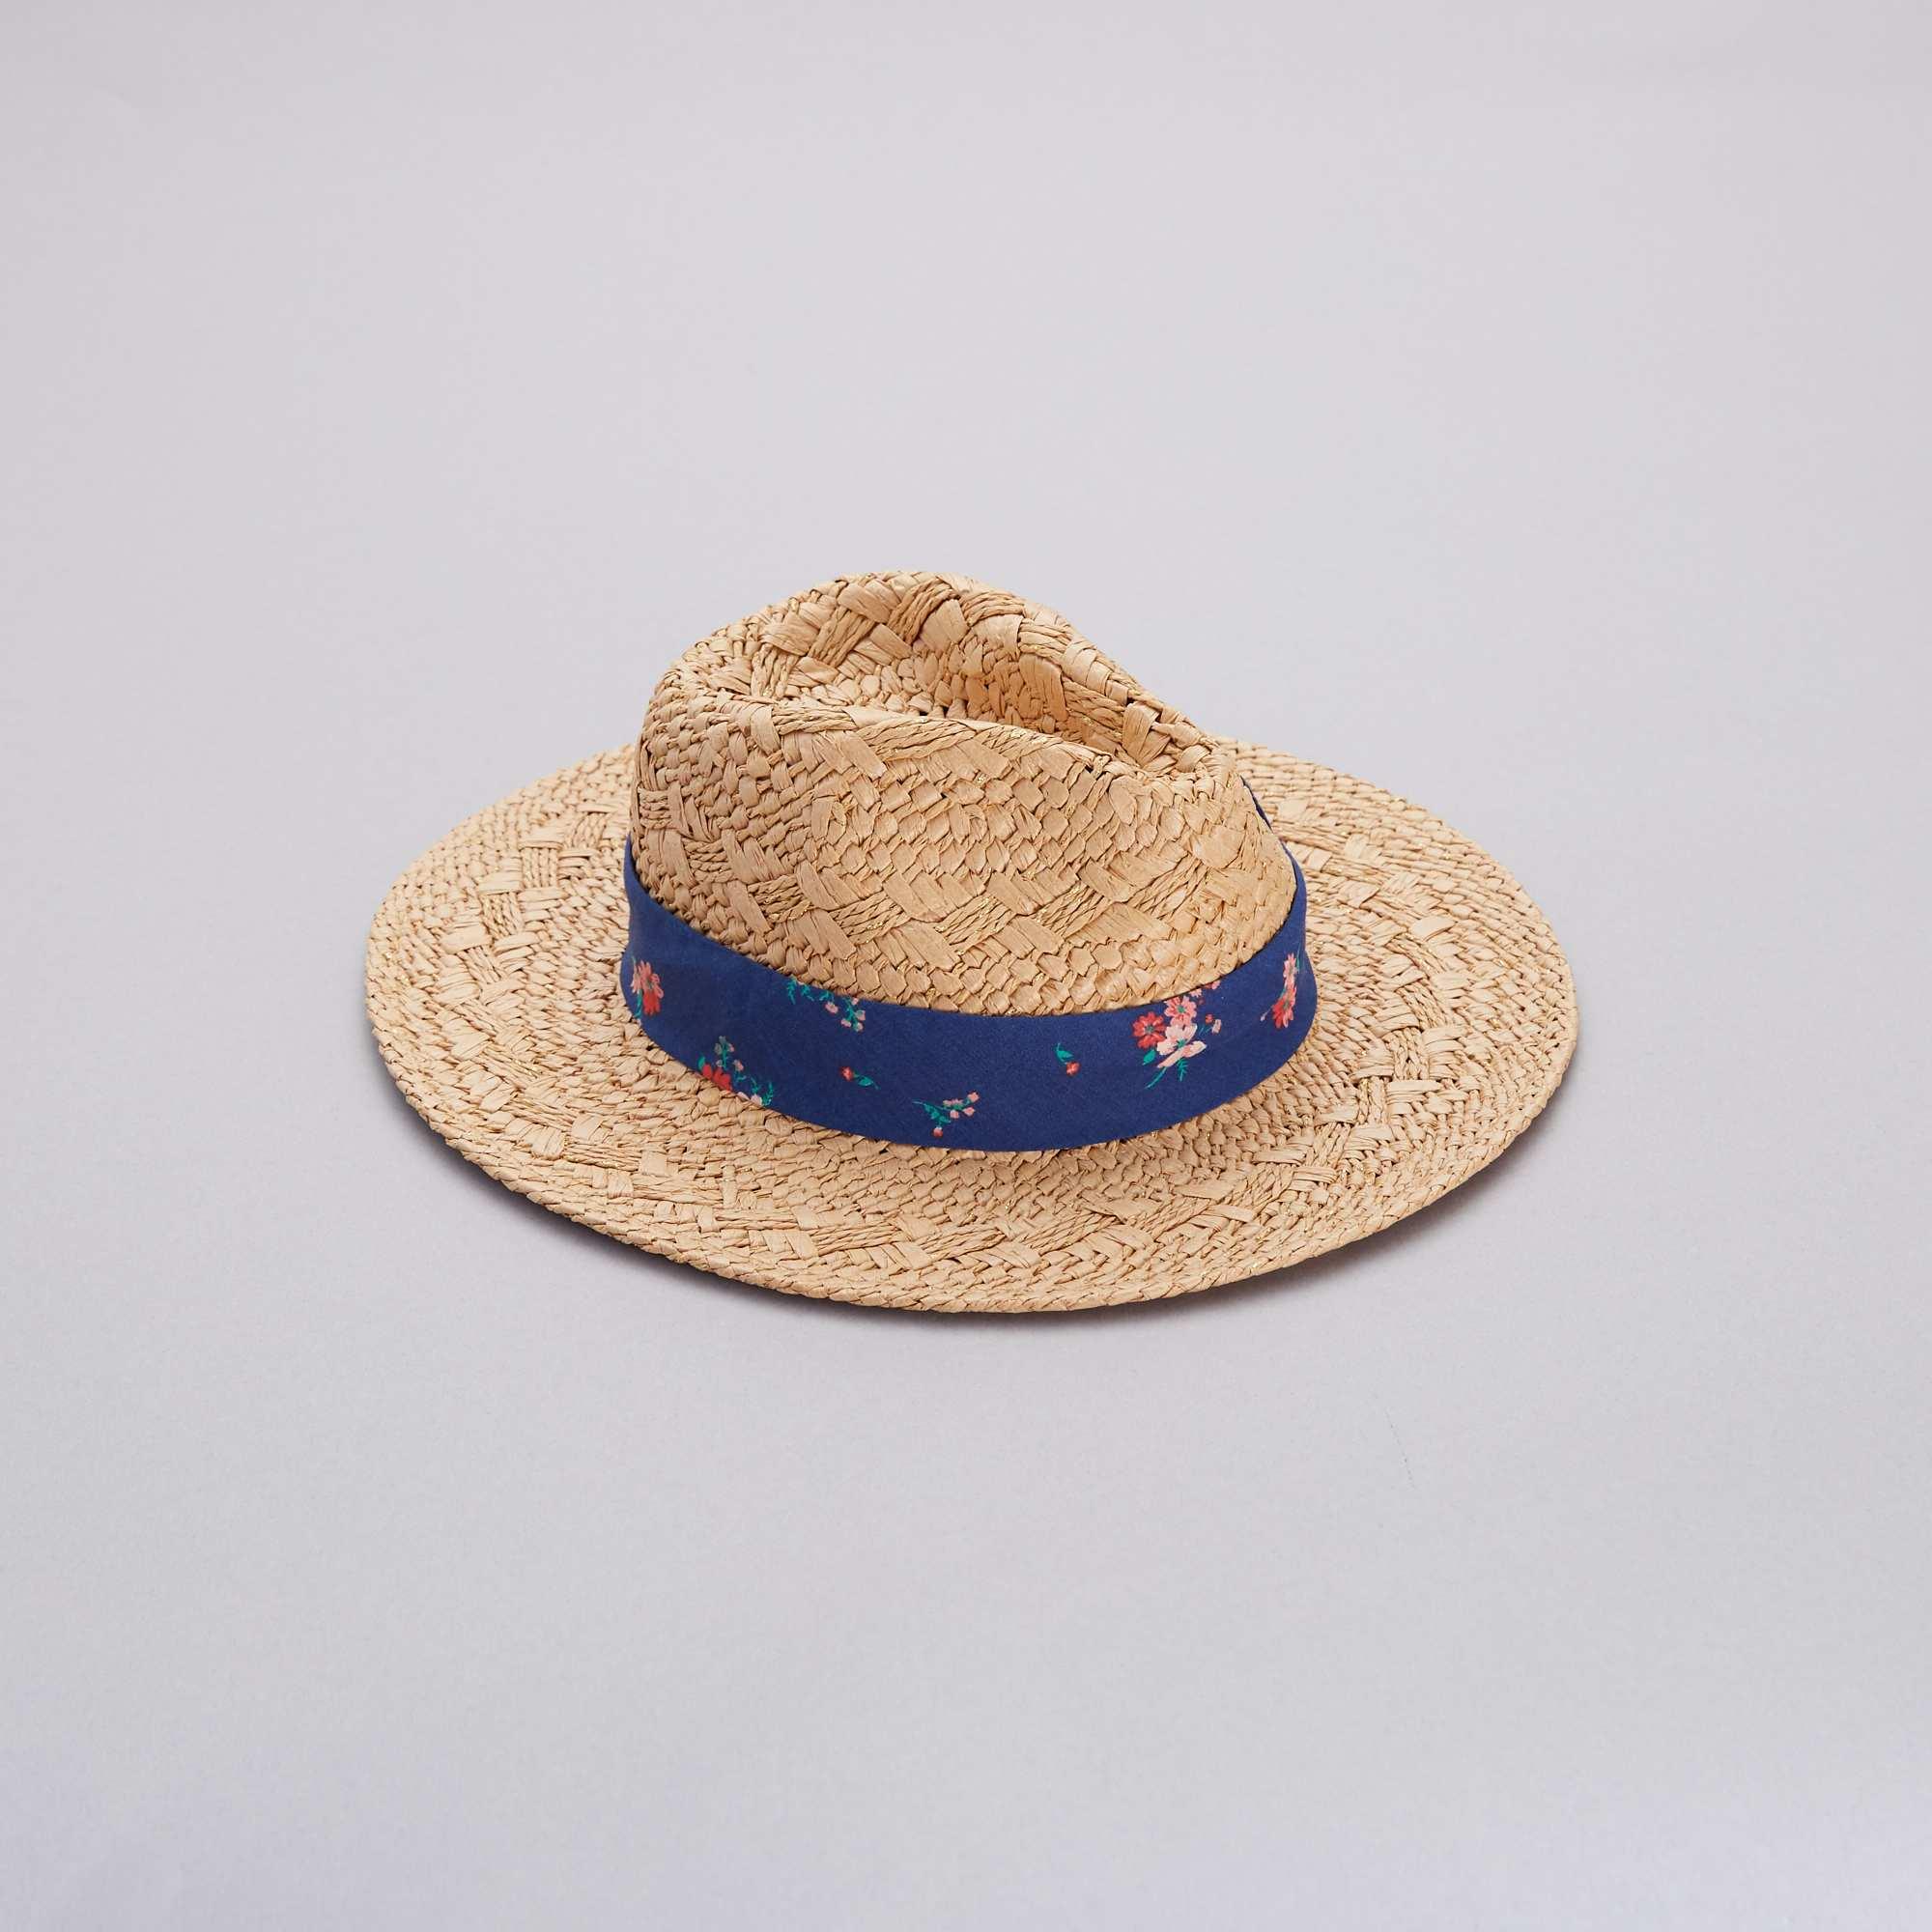 979703b5e7878 Chapeau de paille Fille - bleu foncé - Kiabi - 2,80€